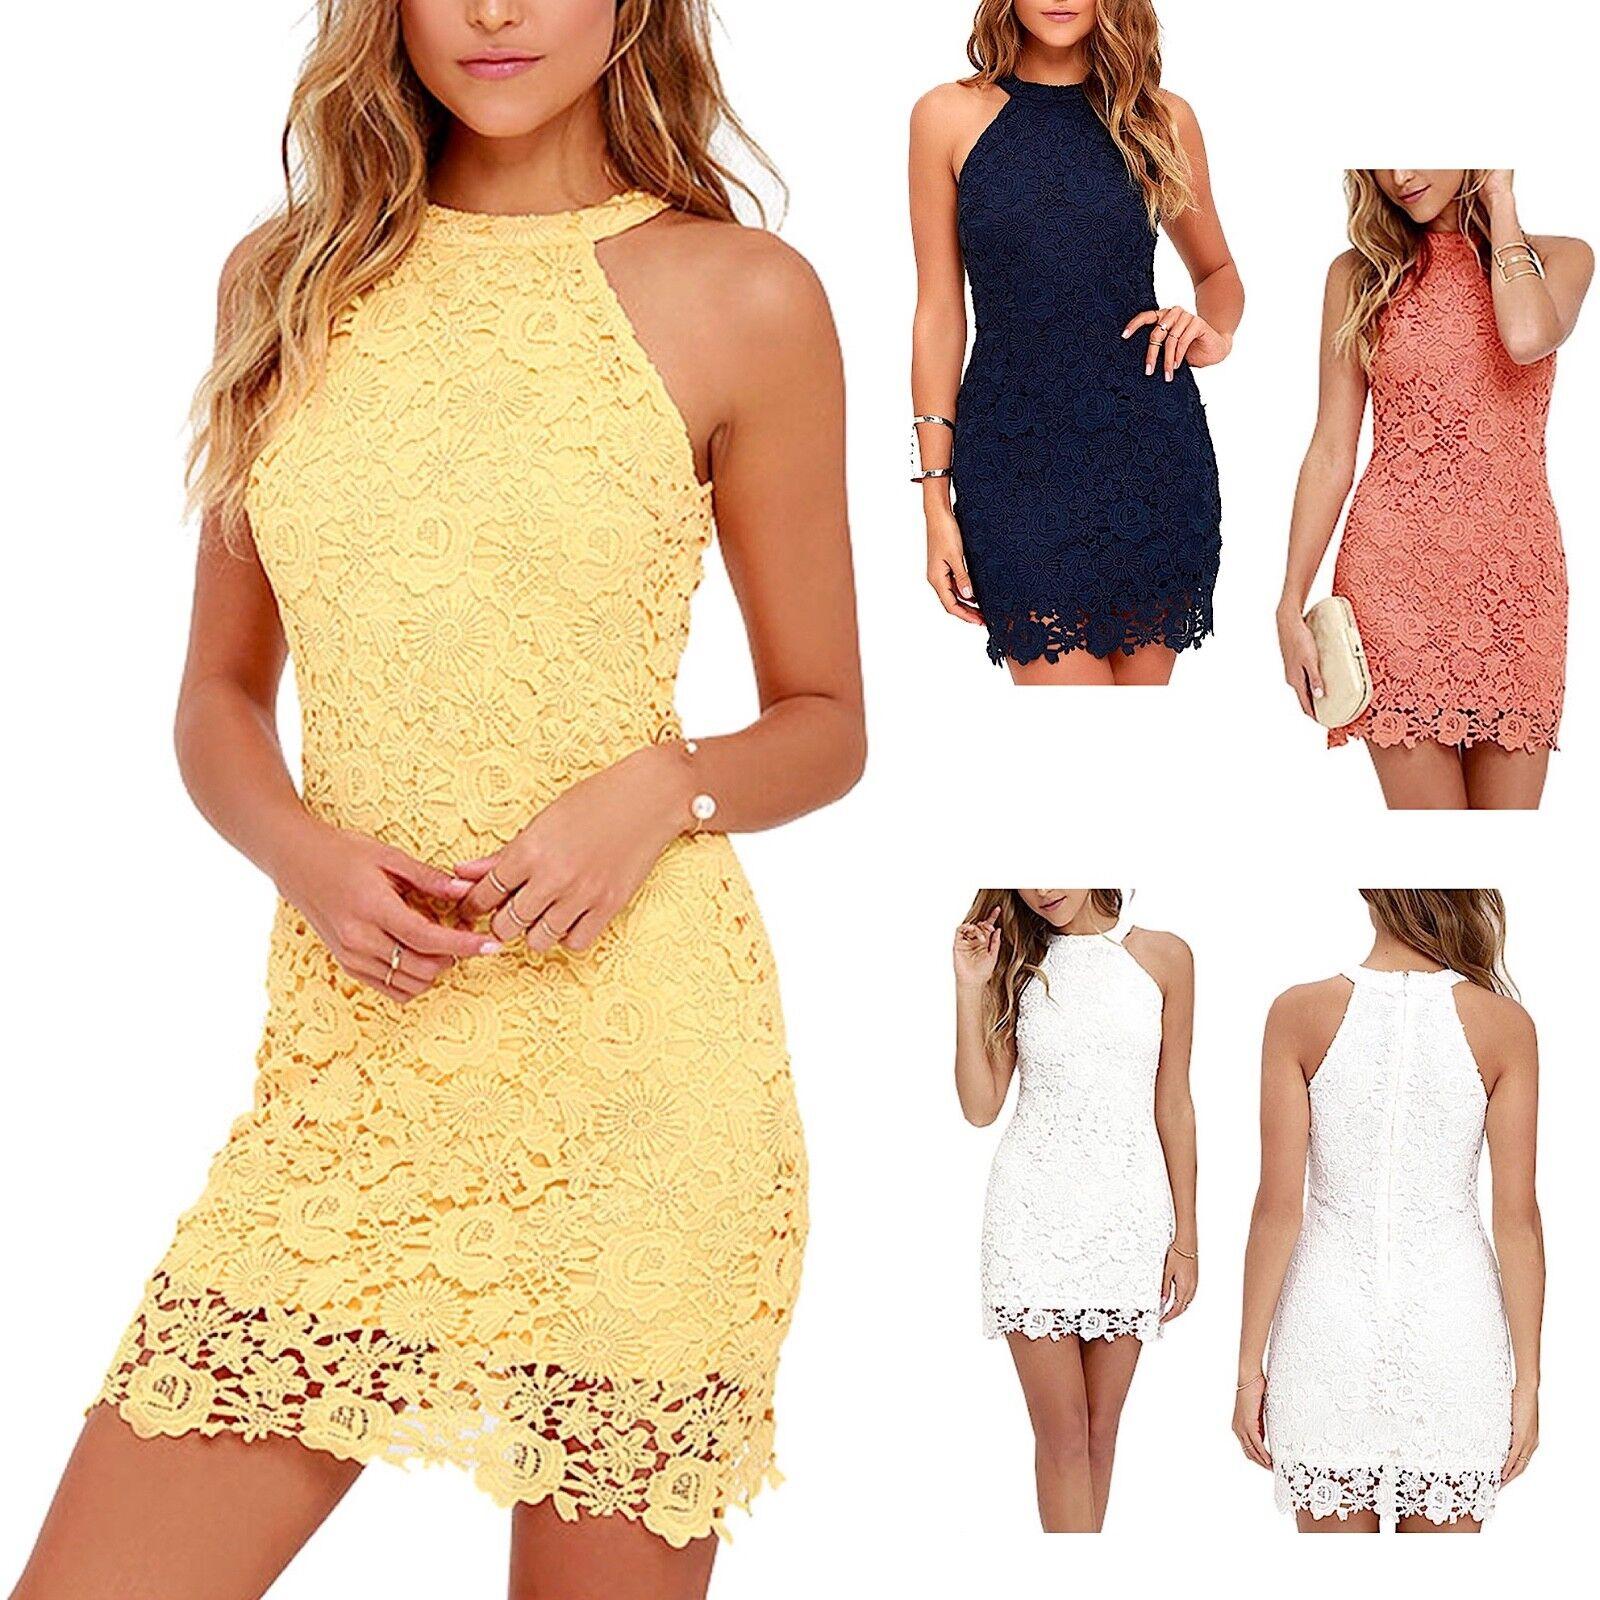 Vestito women Woman Dress - Mini dress Vestitino Pizzo Vari colori 110013B P